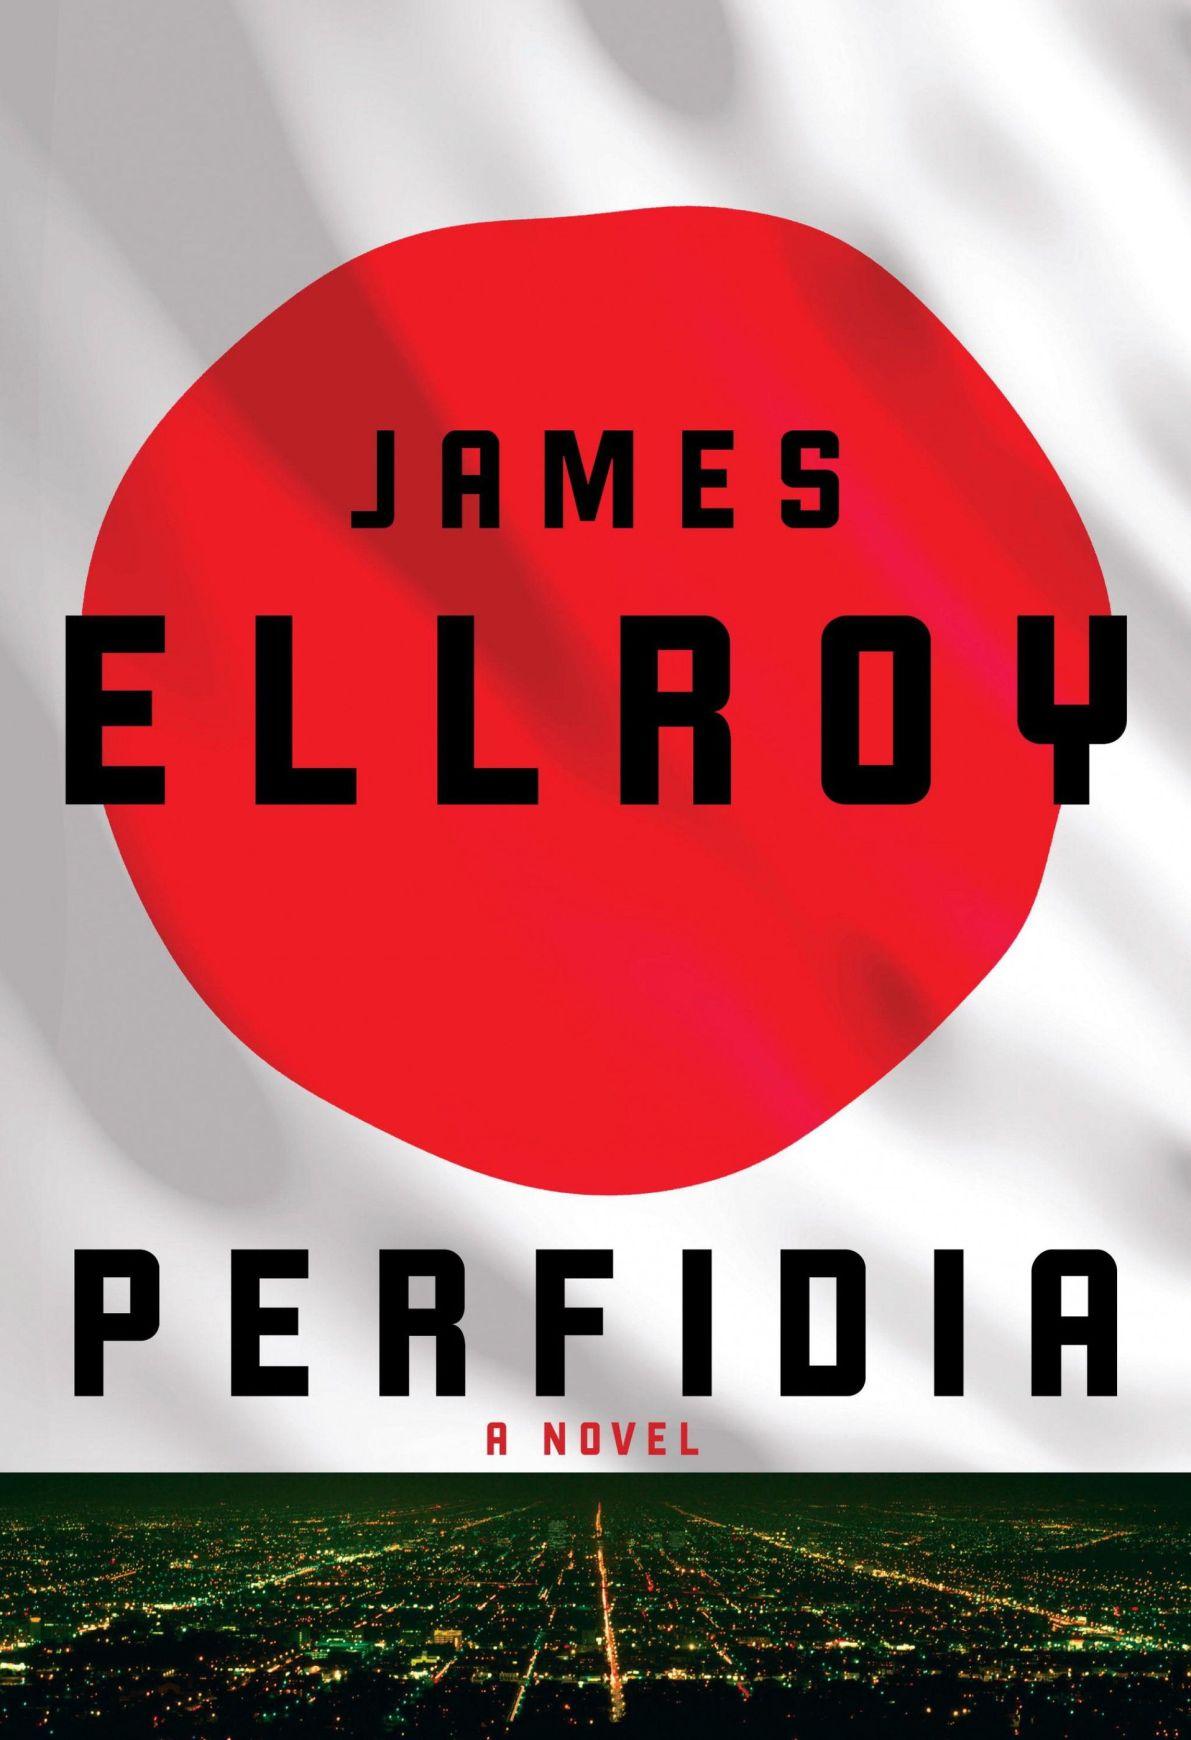 Ellroy's 'Perfidia' start of new L.A. quartet